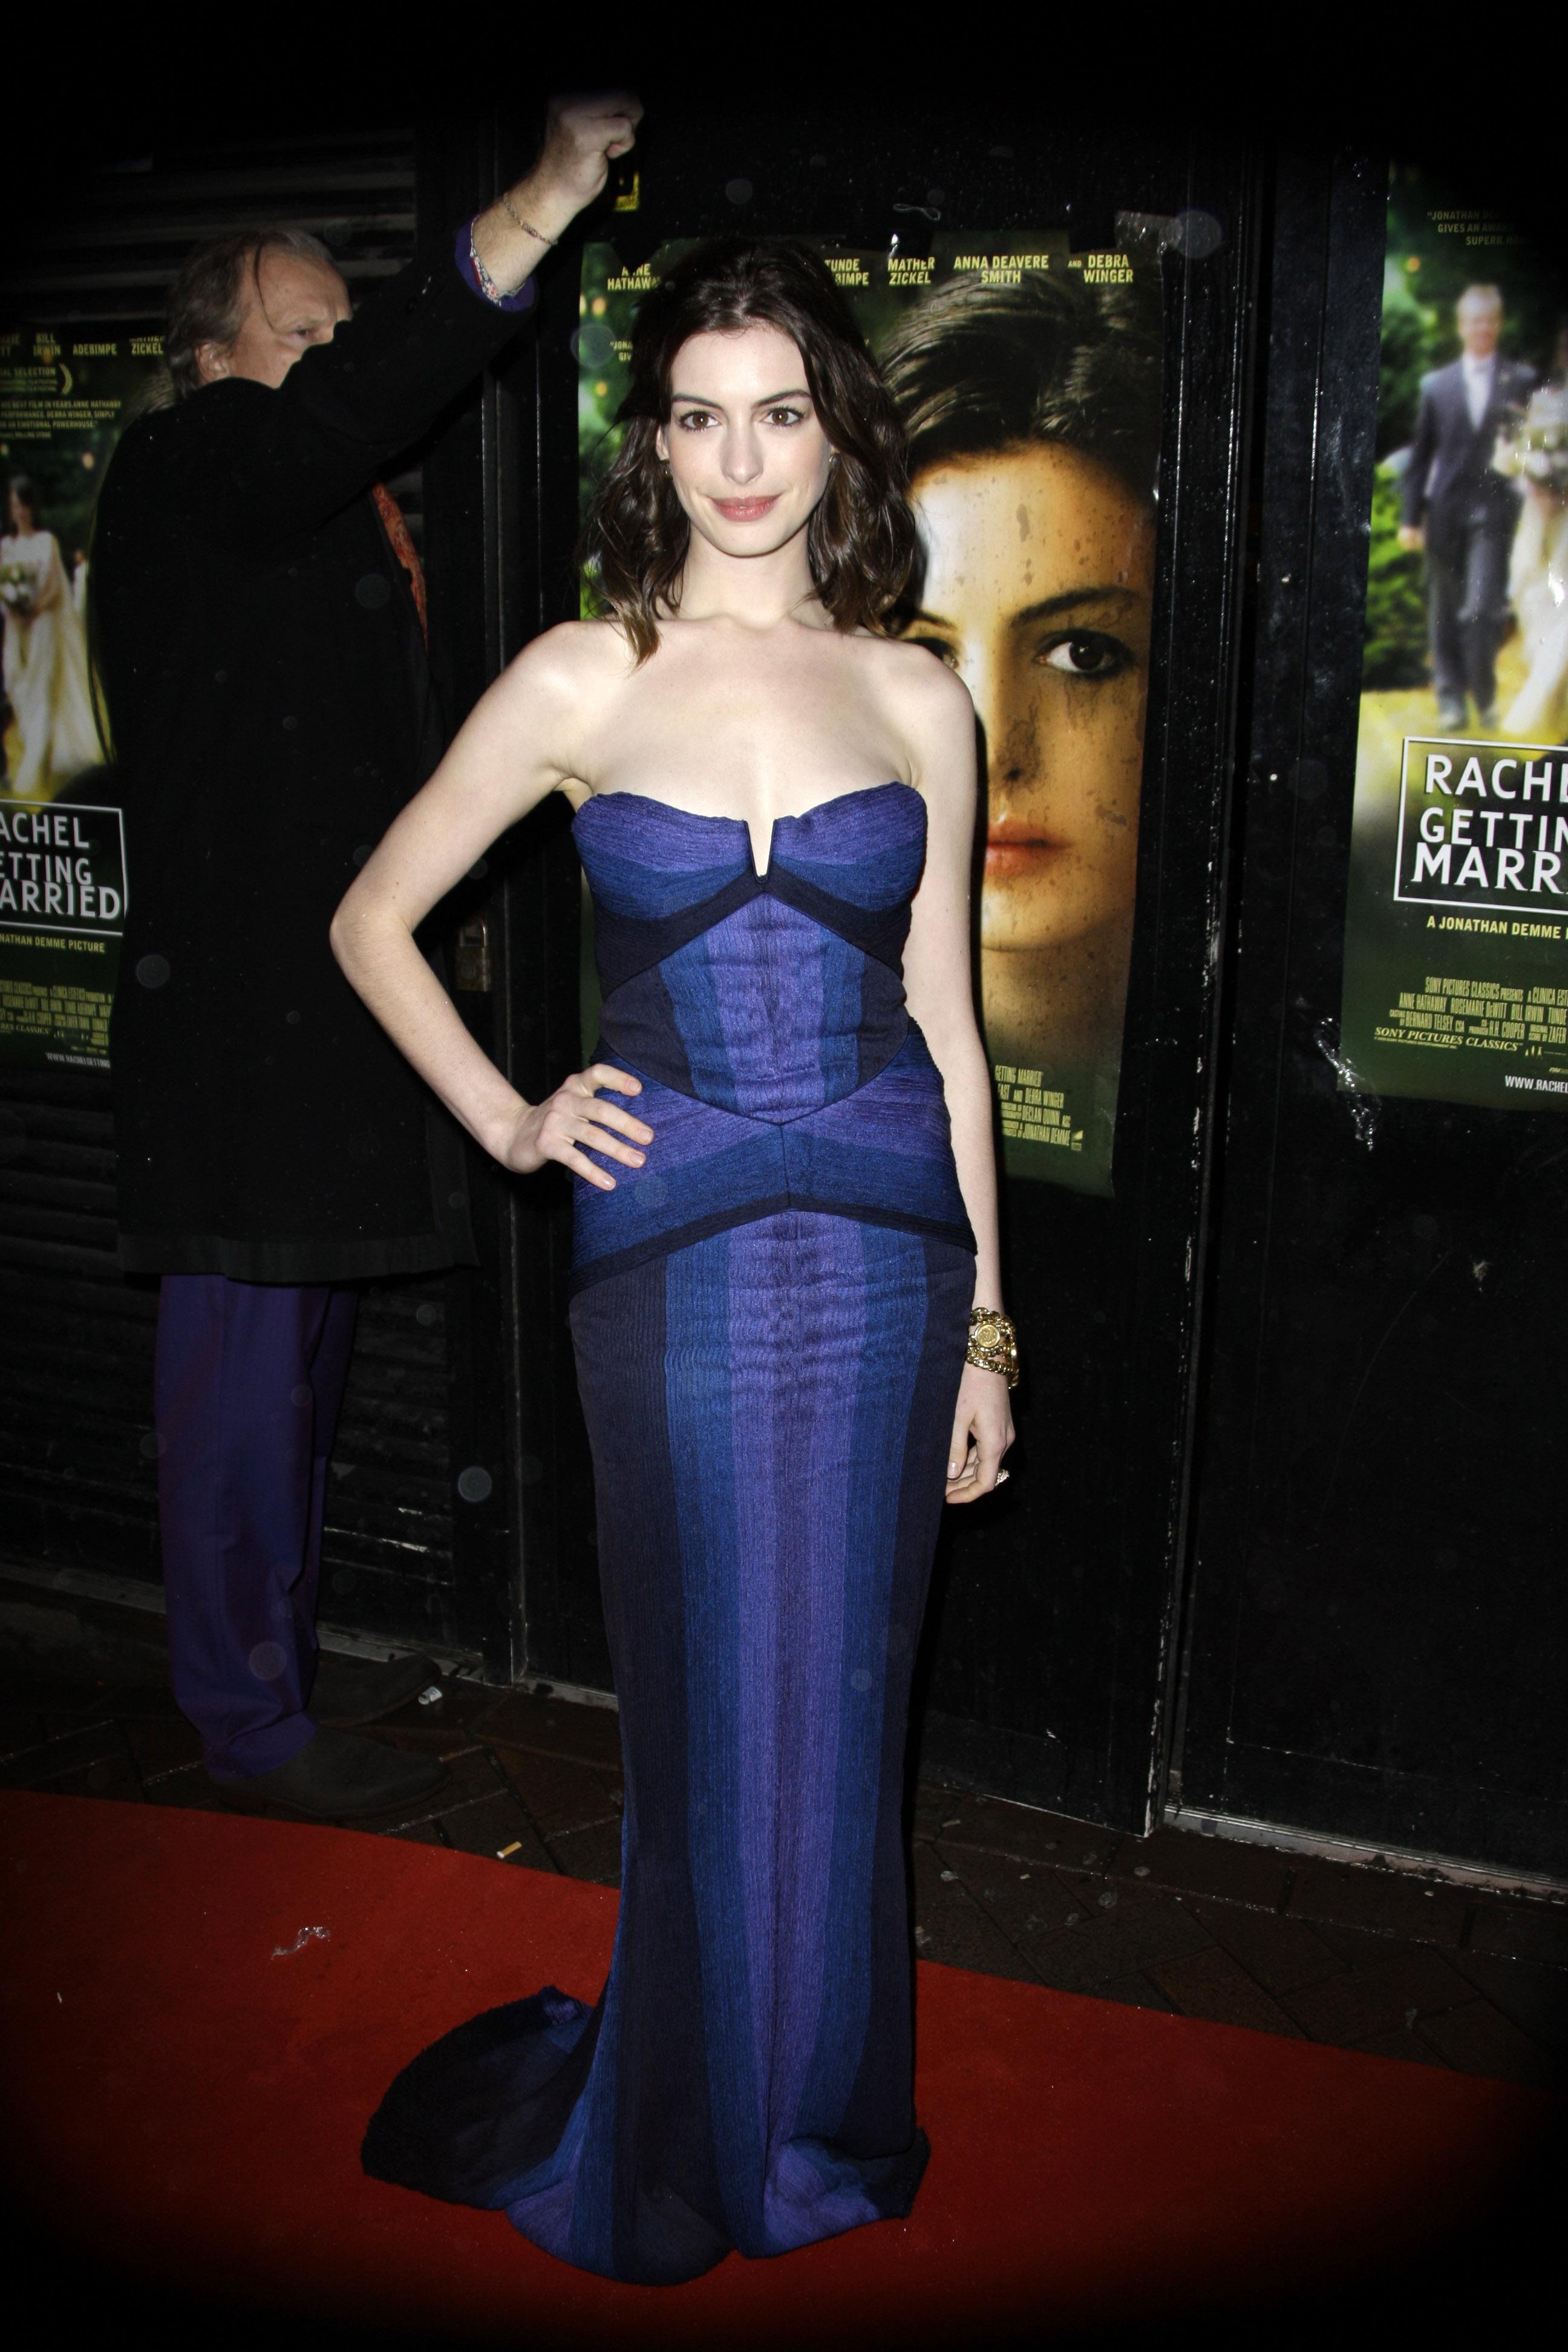 36078_Anne_Hathaway-Rachel_Getting_Married_premiere-008_122_515lo.jpg